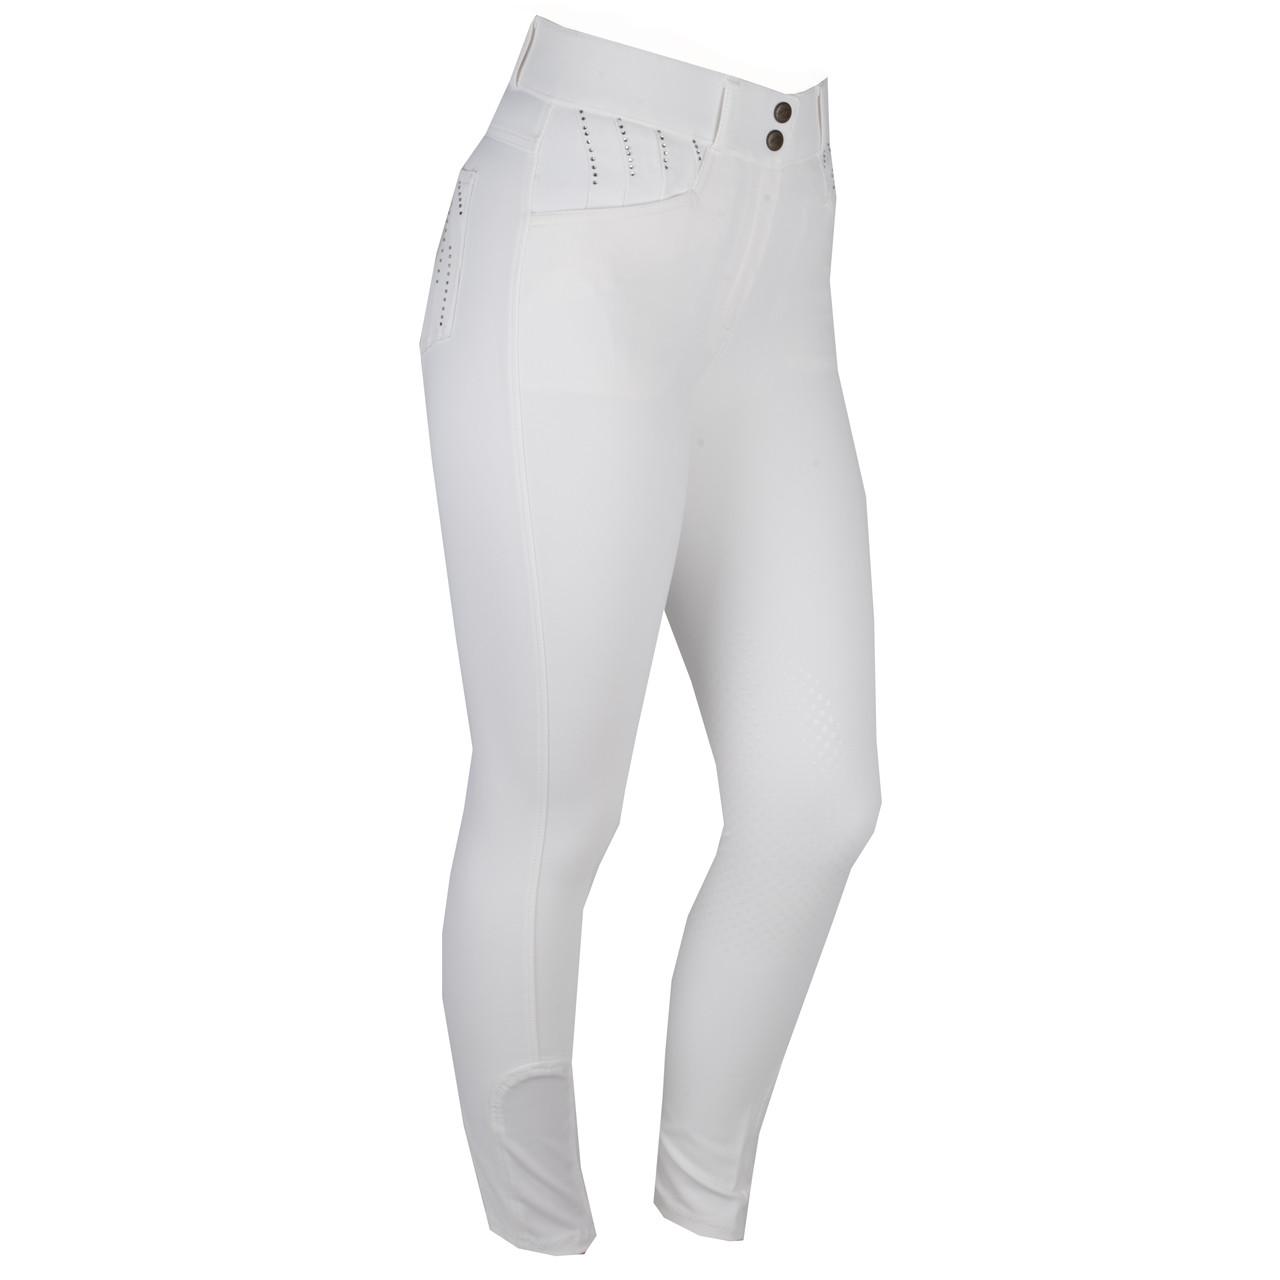 Mondoni Crystal high waist KG rijbroek wit maat:34